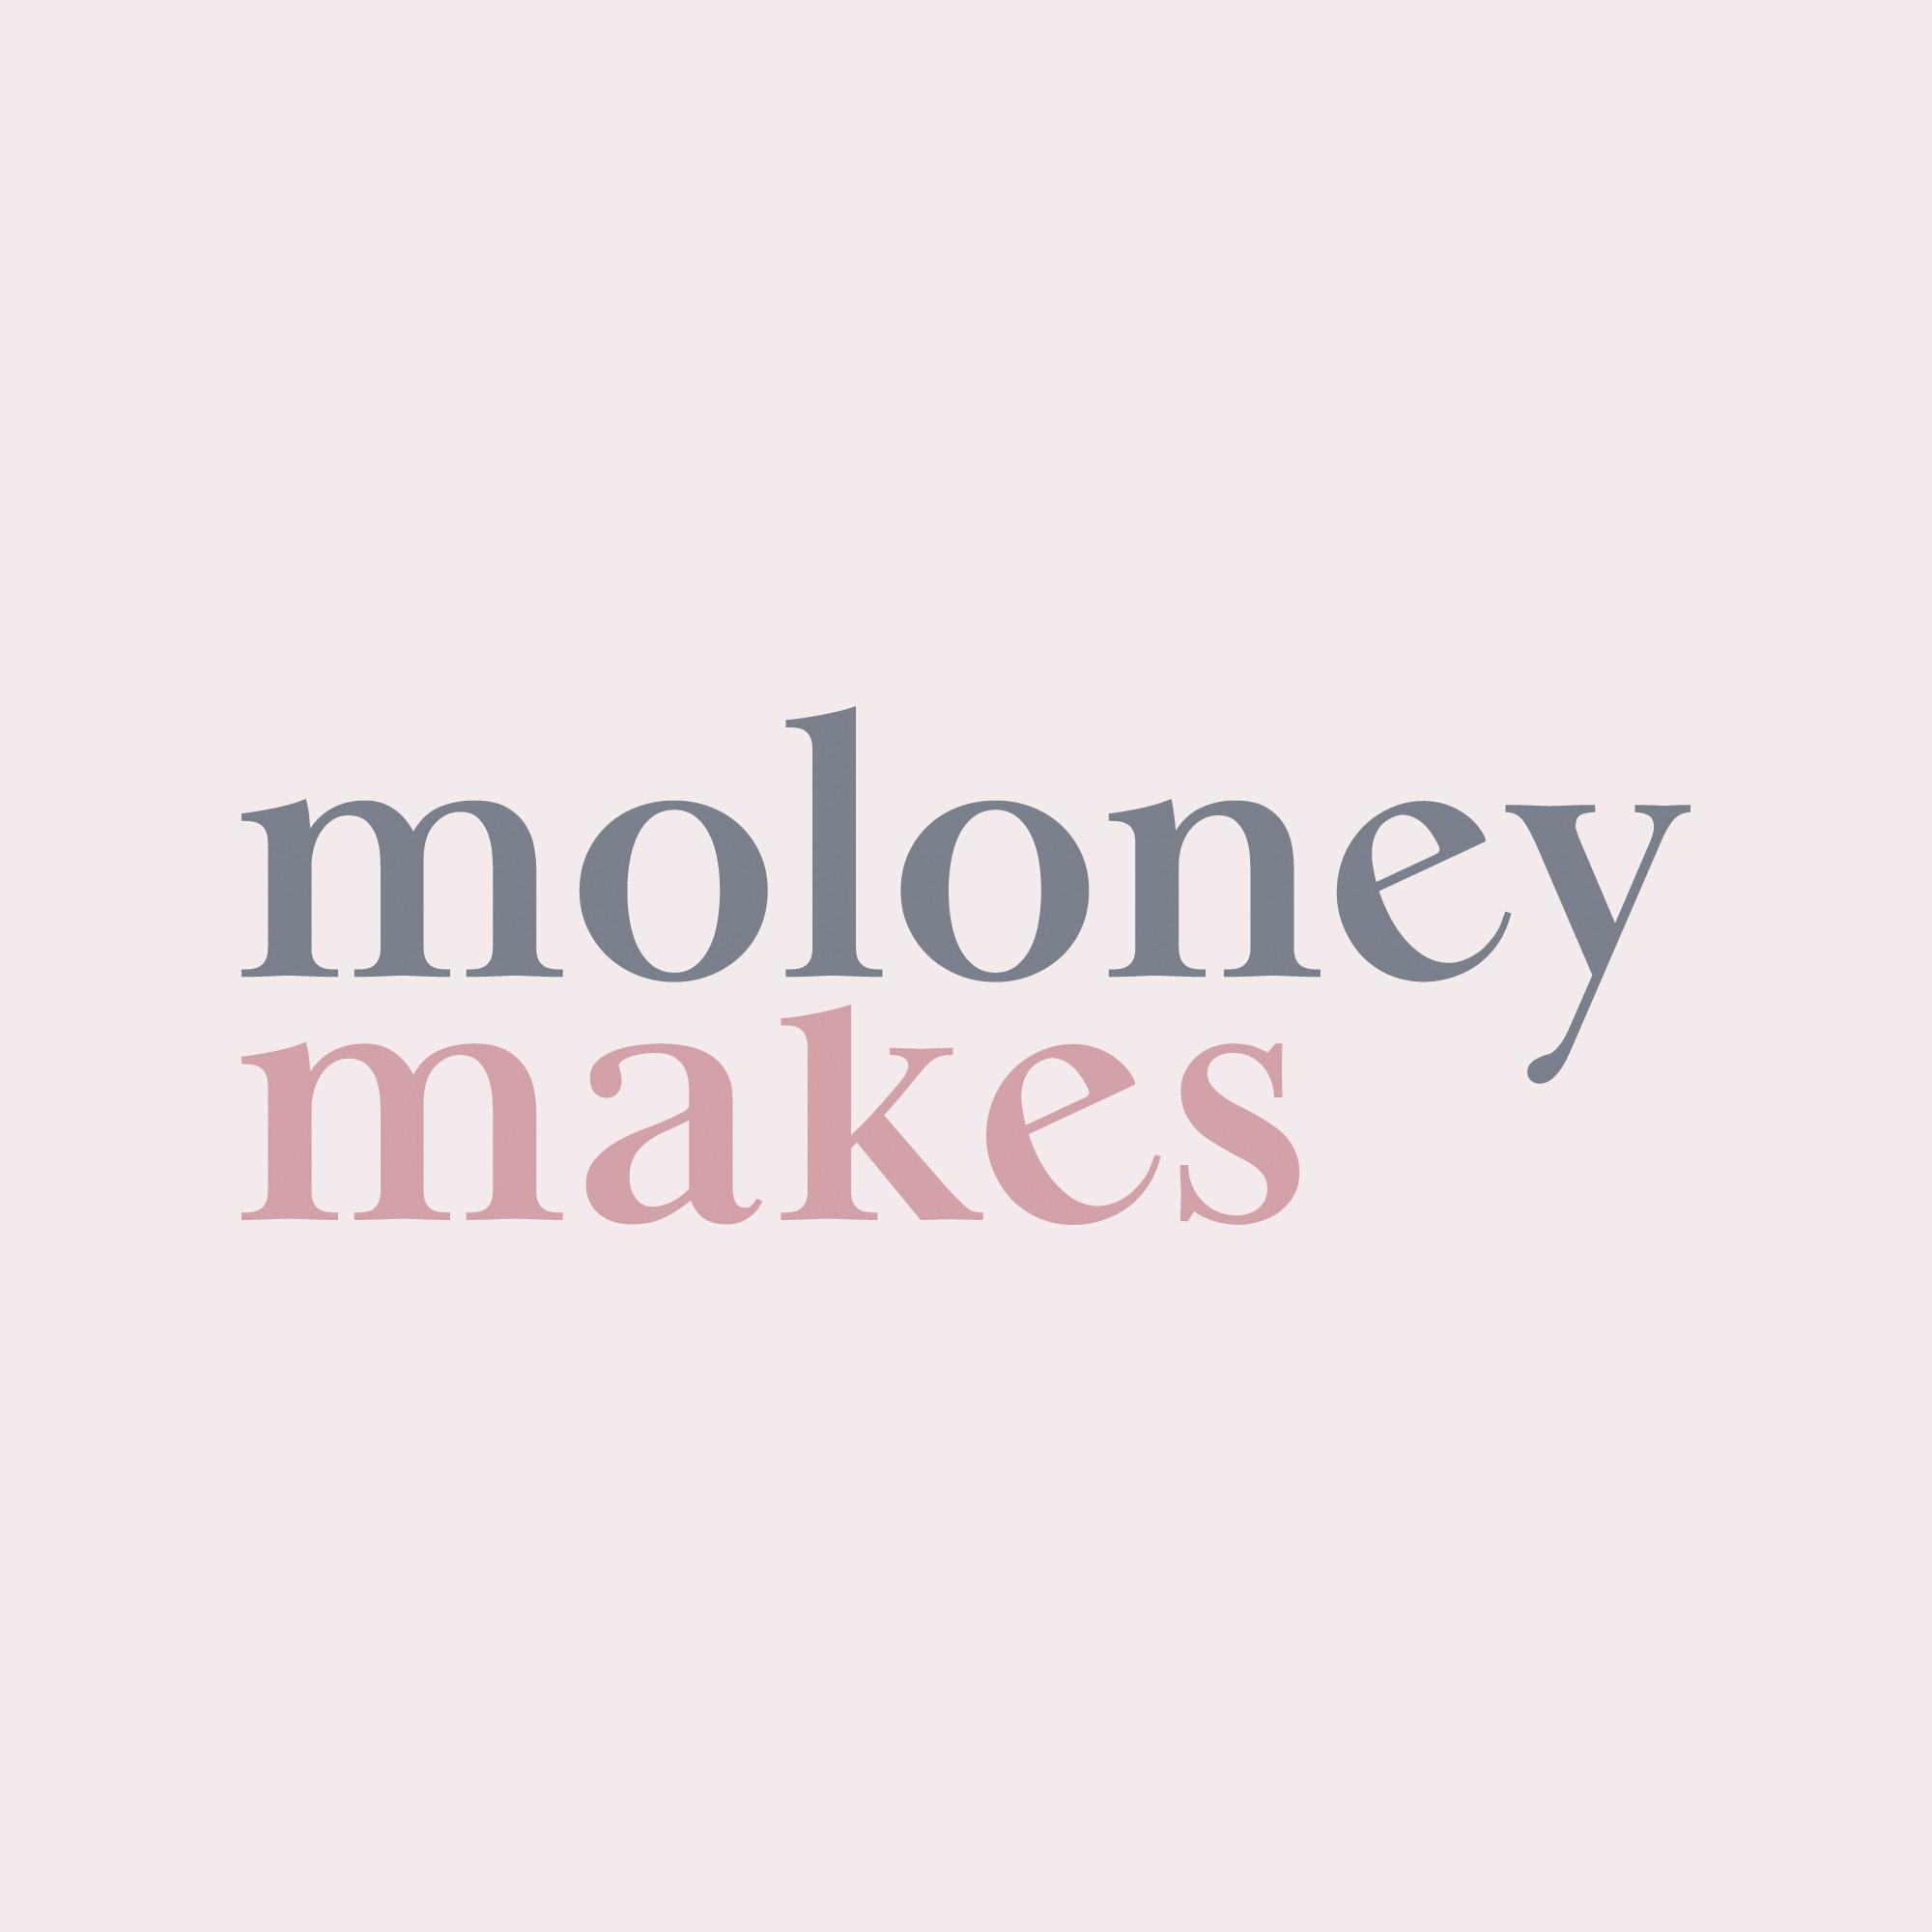 Moloneymakes